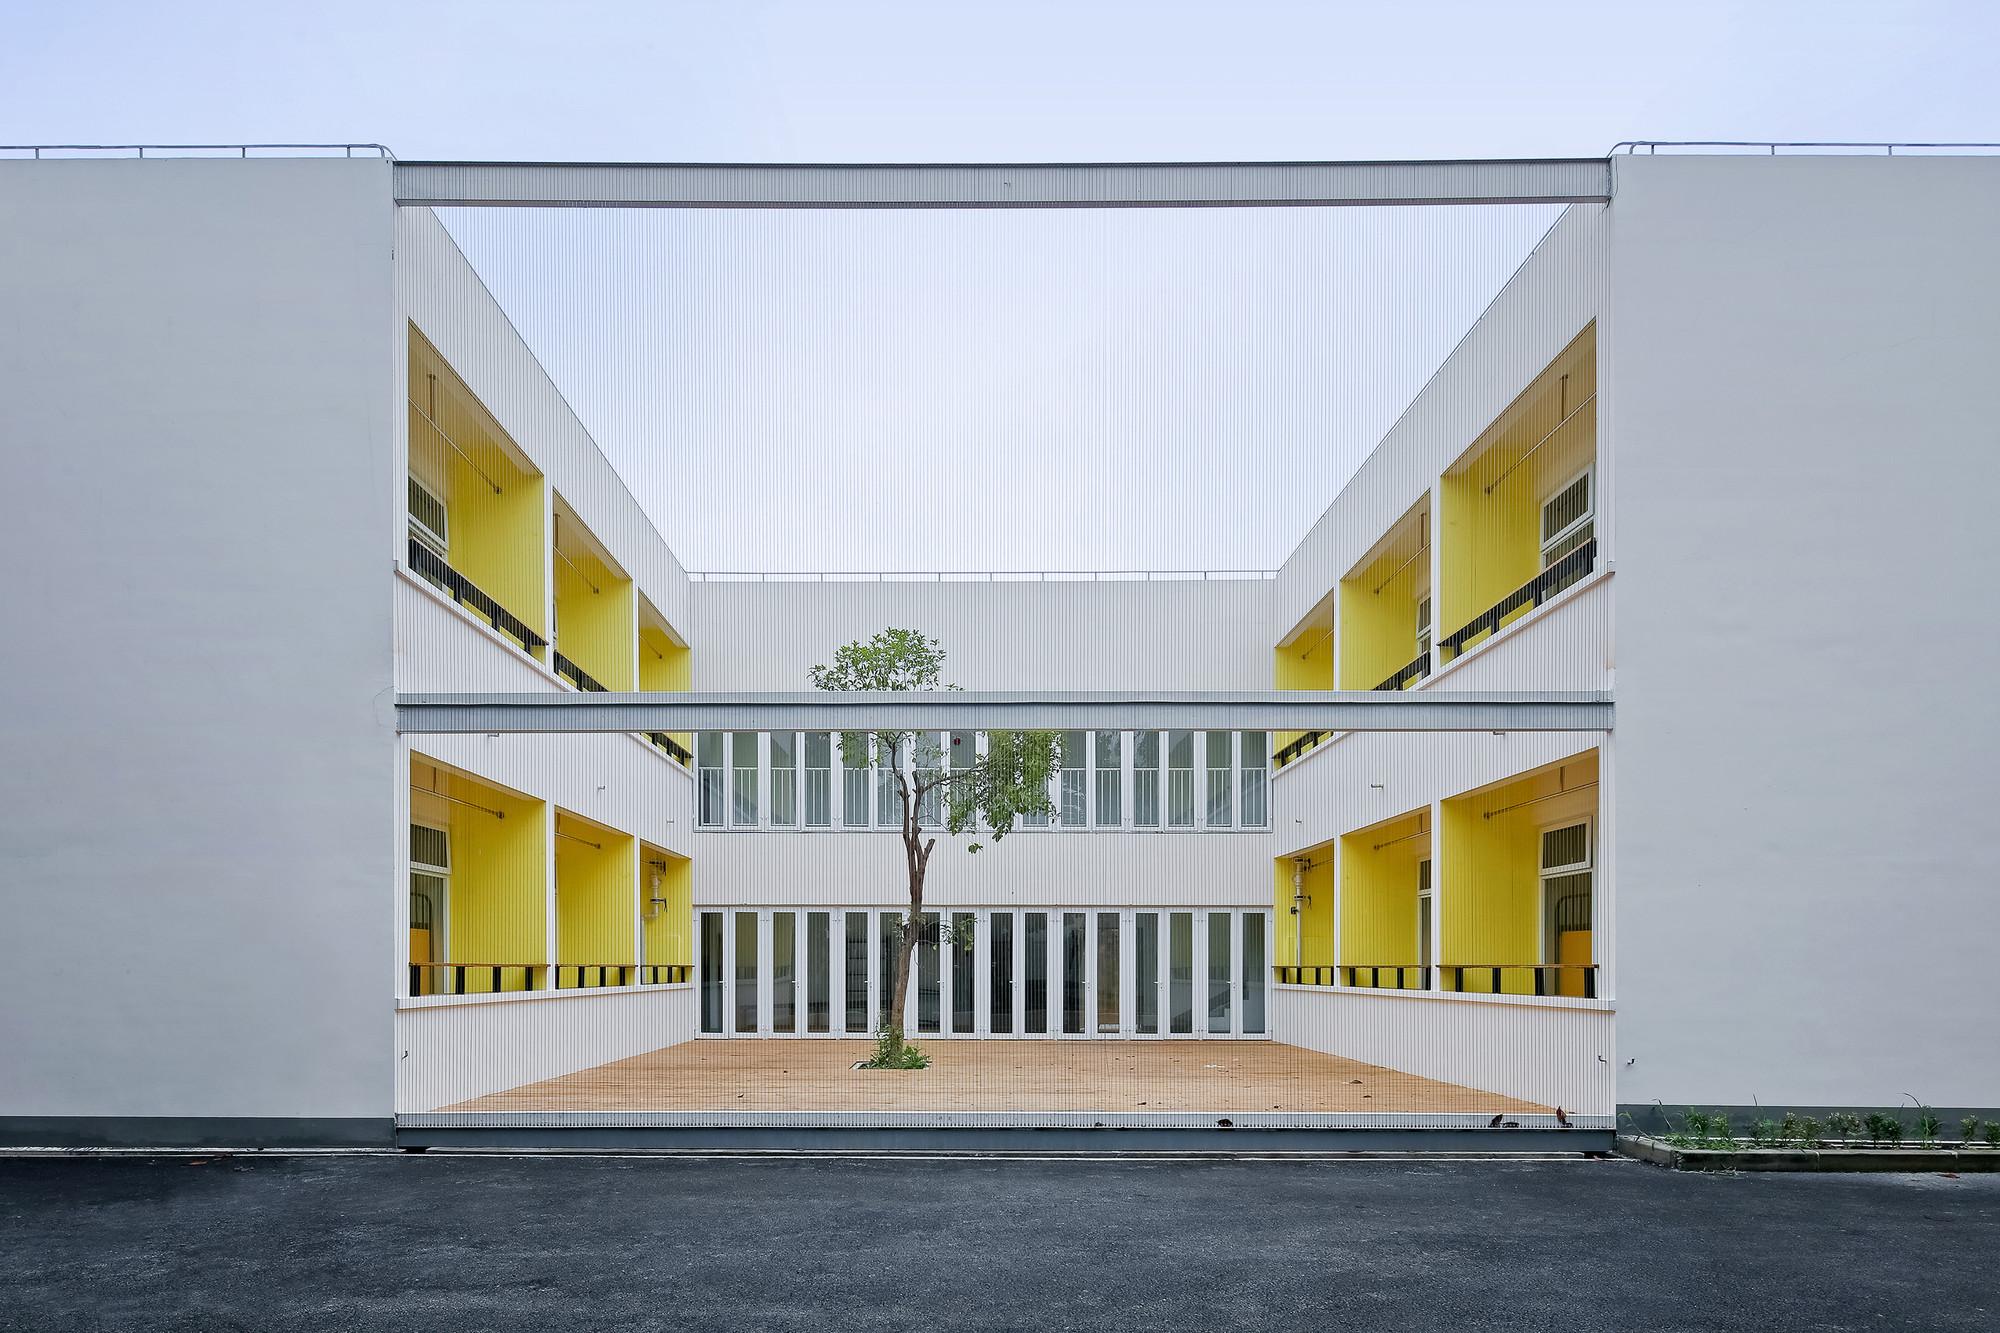 Albergue para Estudiantes / Wuyang Architecture, © SU Shengliang